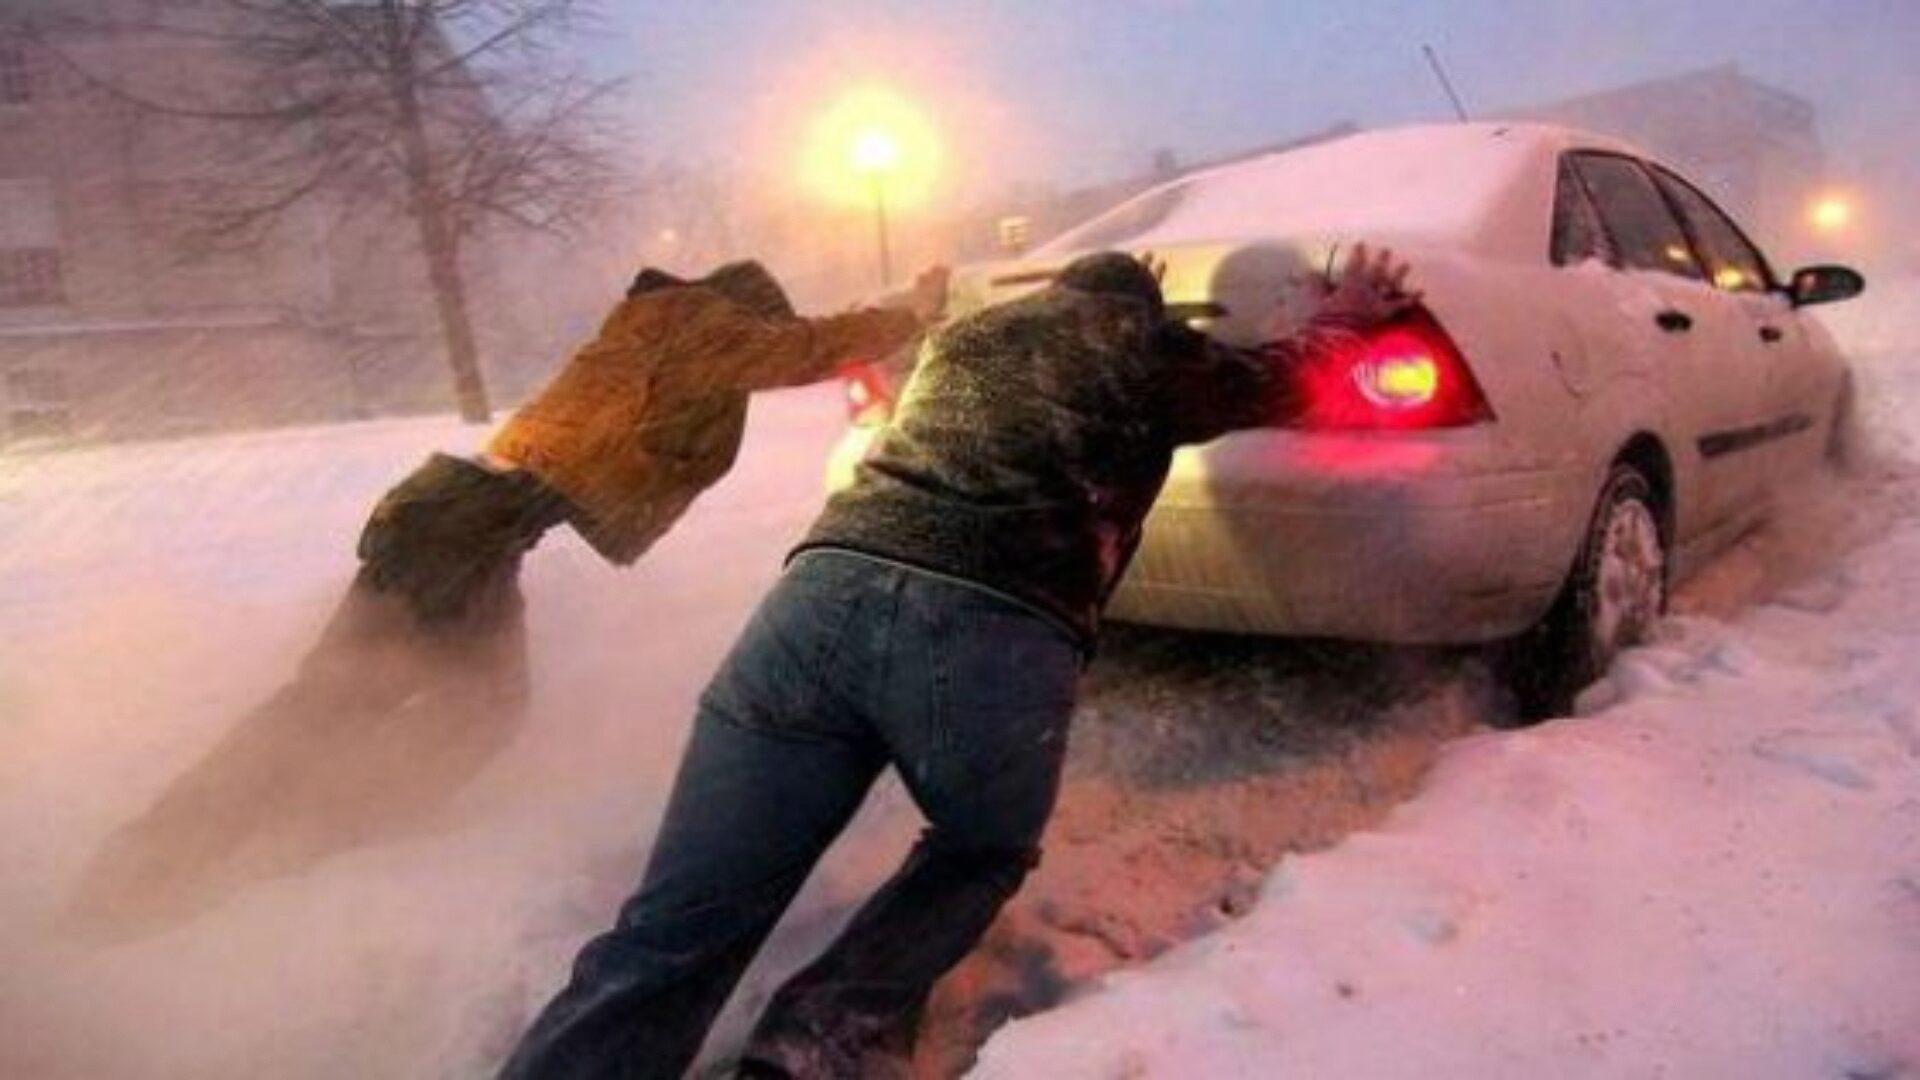 Зимой машины часто не хотят заводиться